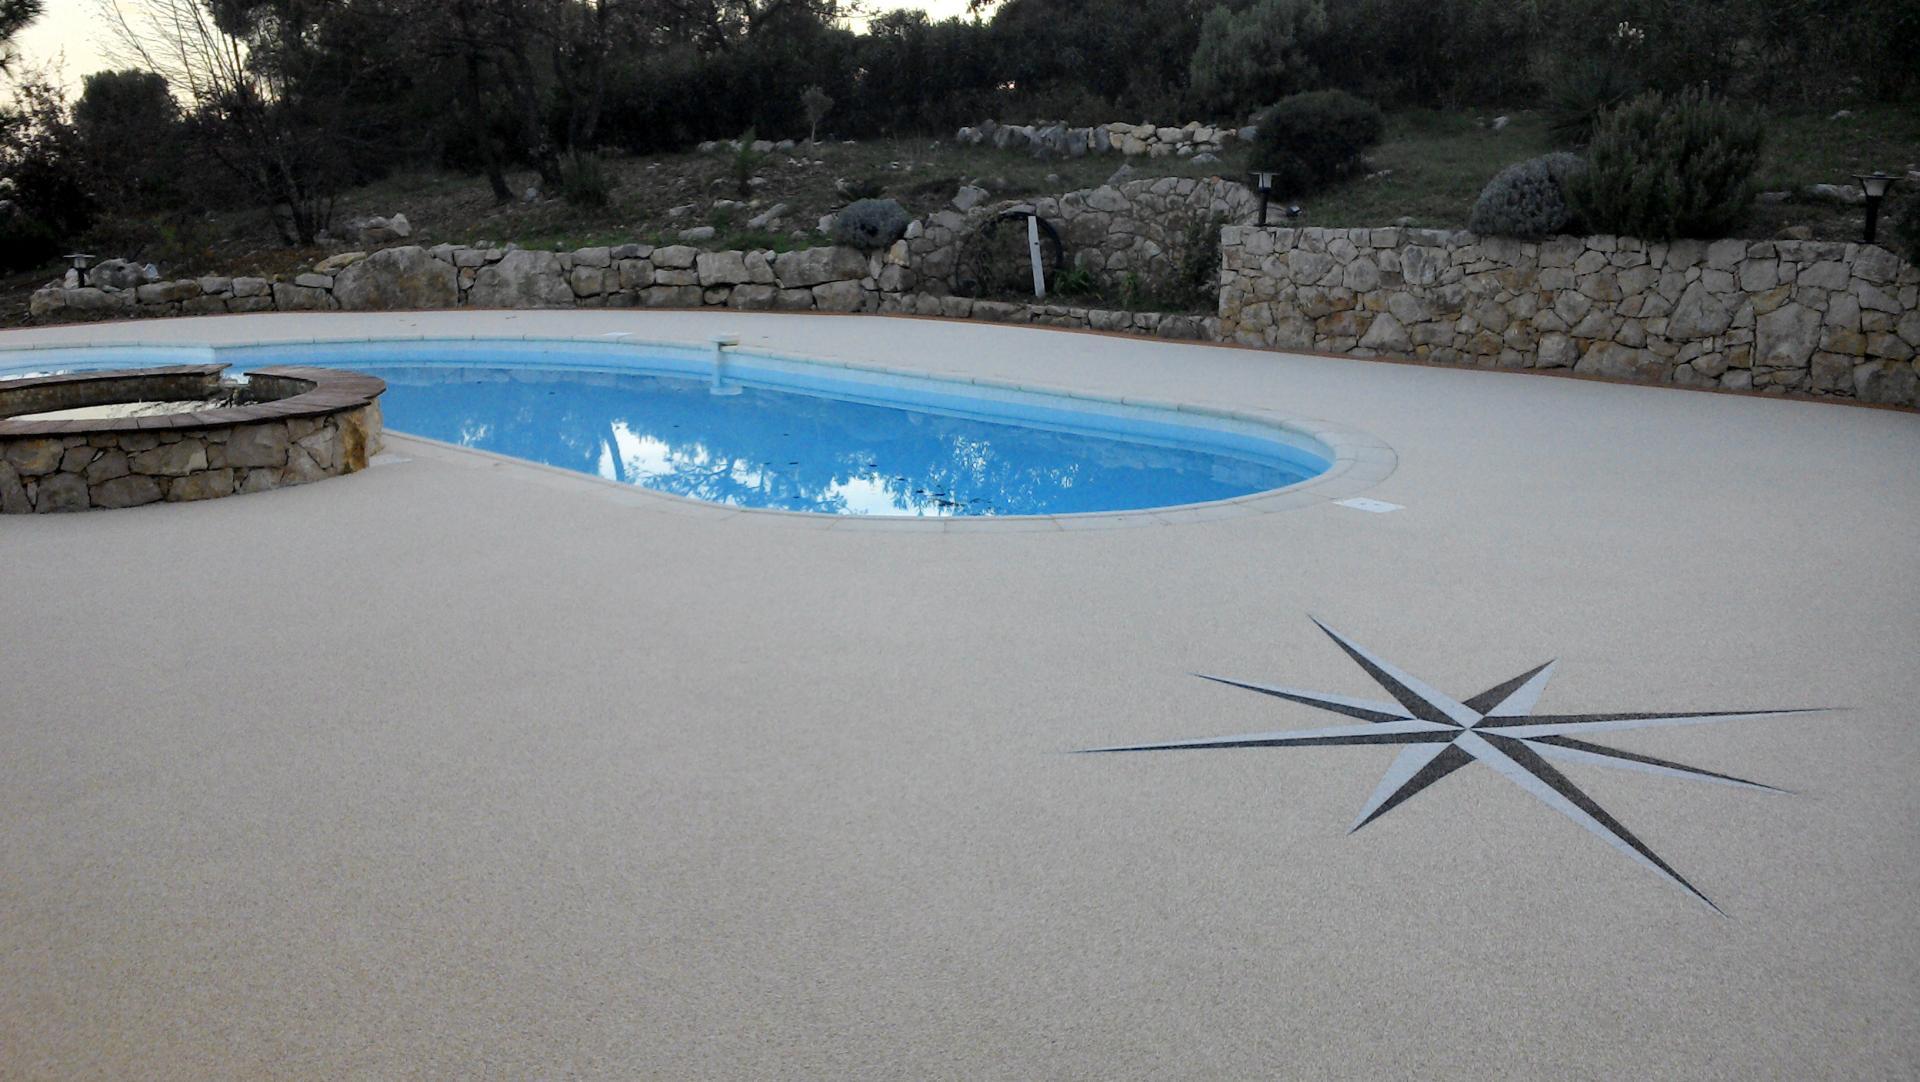 plage piscine granulats